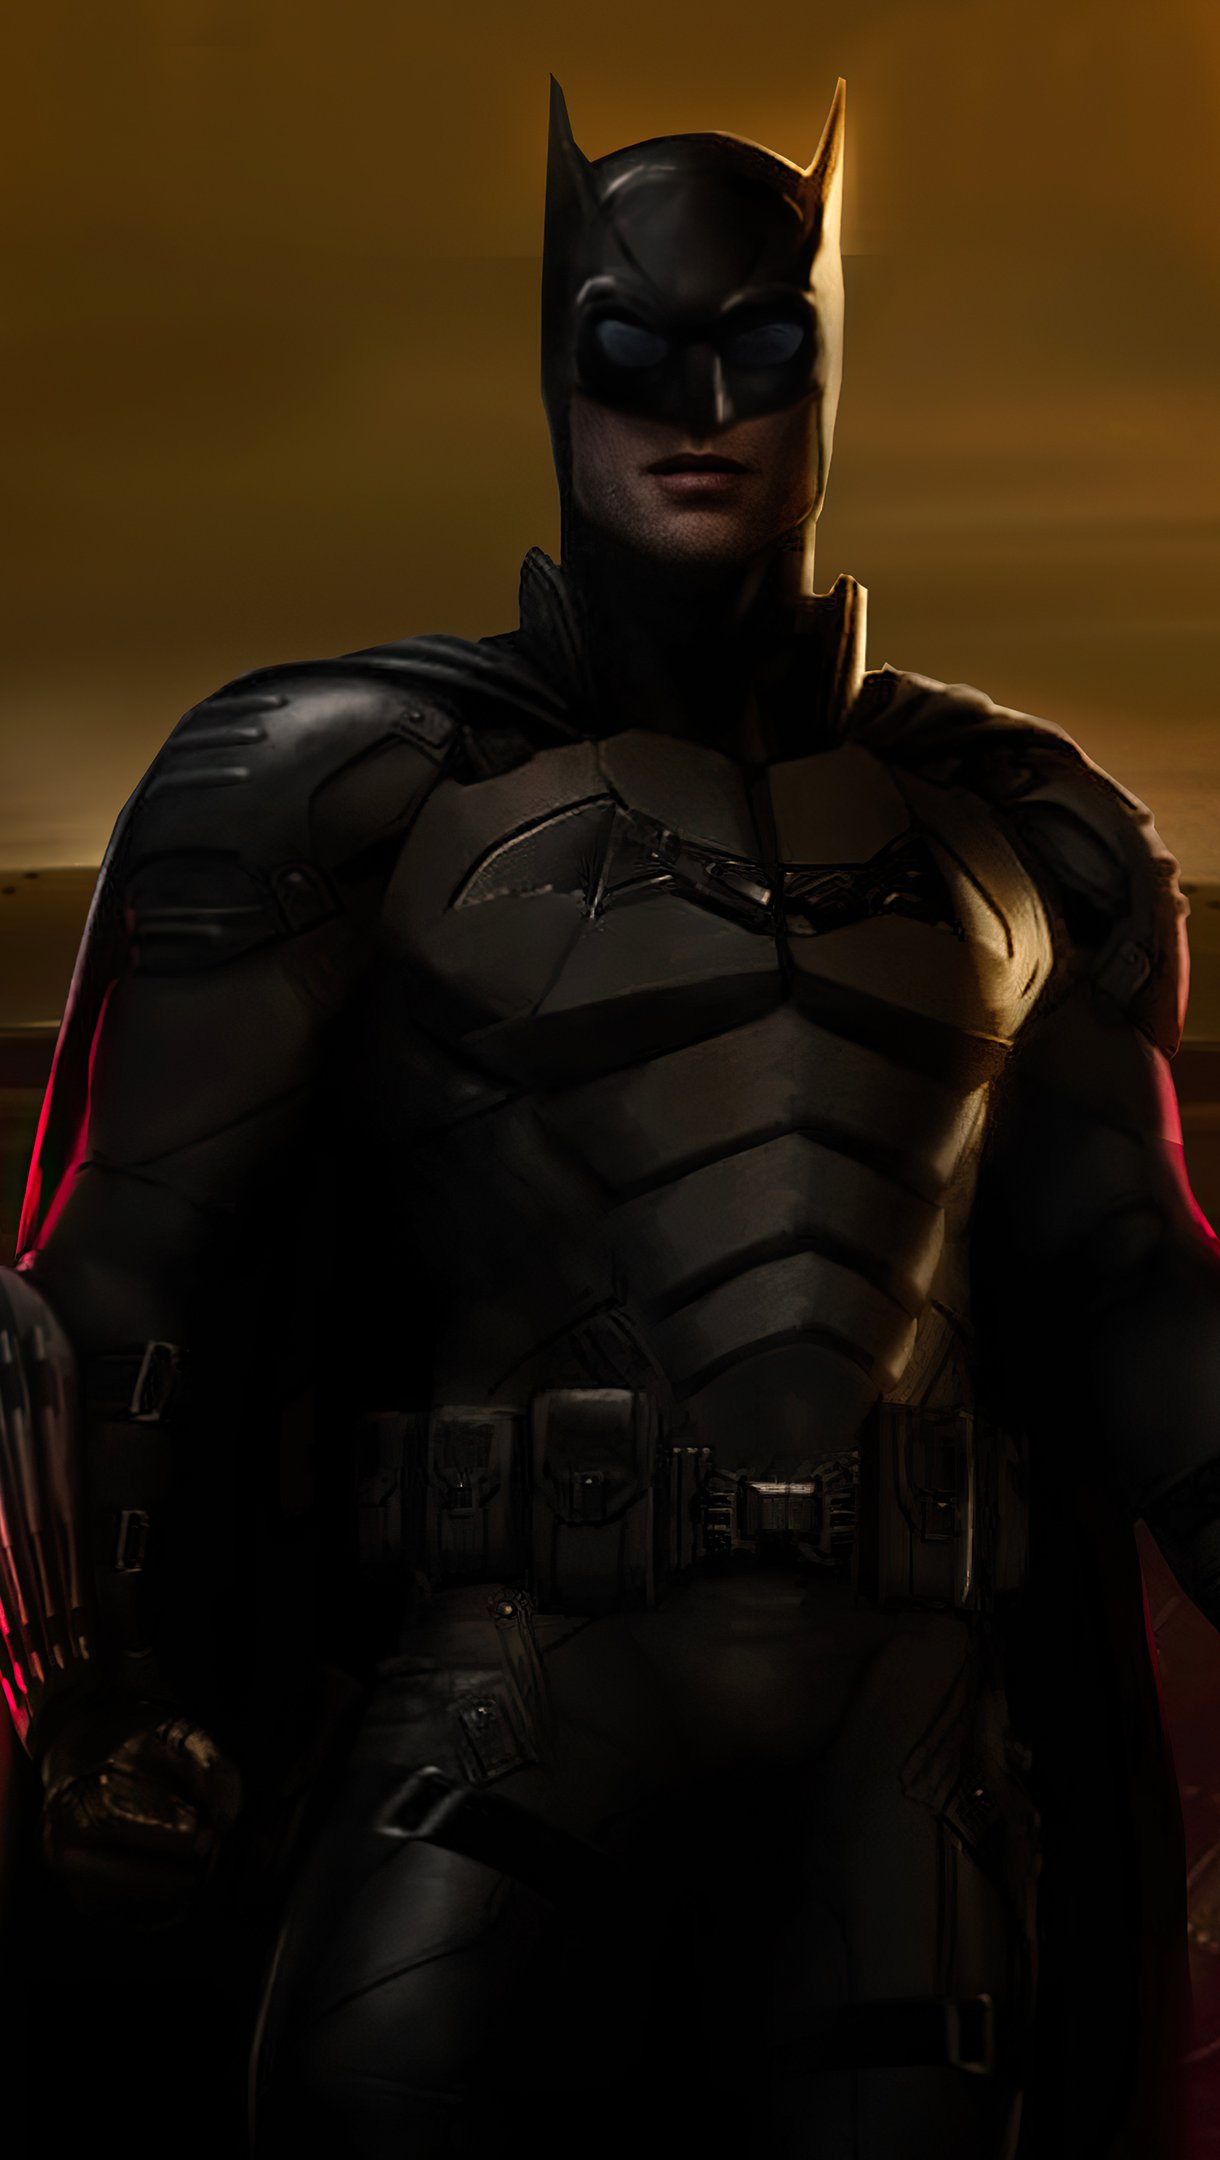 Fondos de pantalla Batman con batimovil Vertical